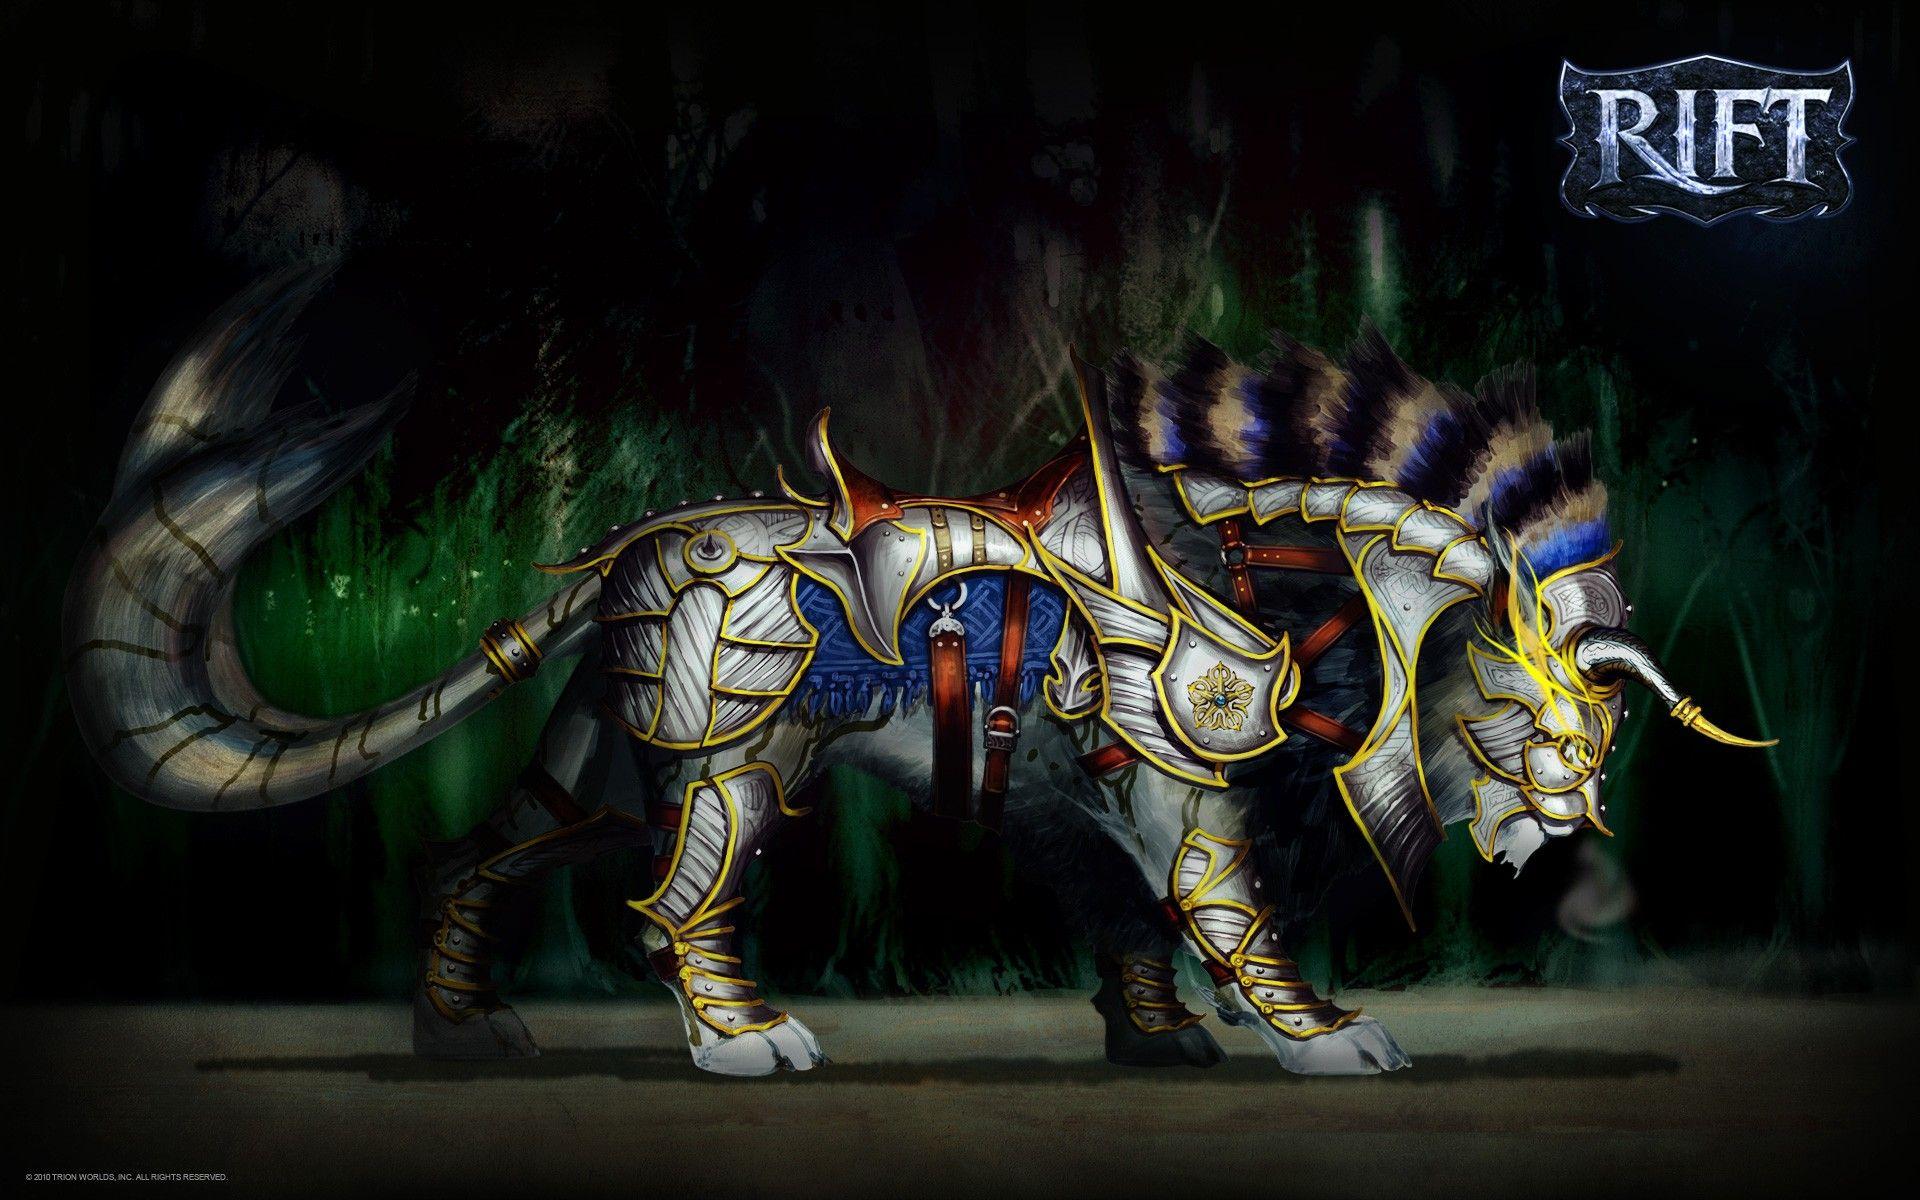 Good Wallpaper Horse Nightmare - 730d8fb80943e334df12e8a4626b4fa0  Perfect Image Reference_934240.jpg